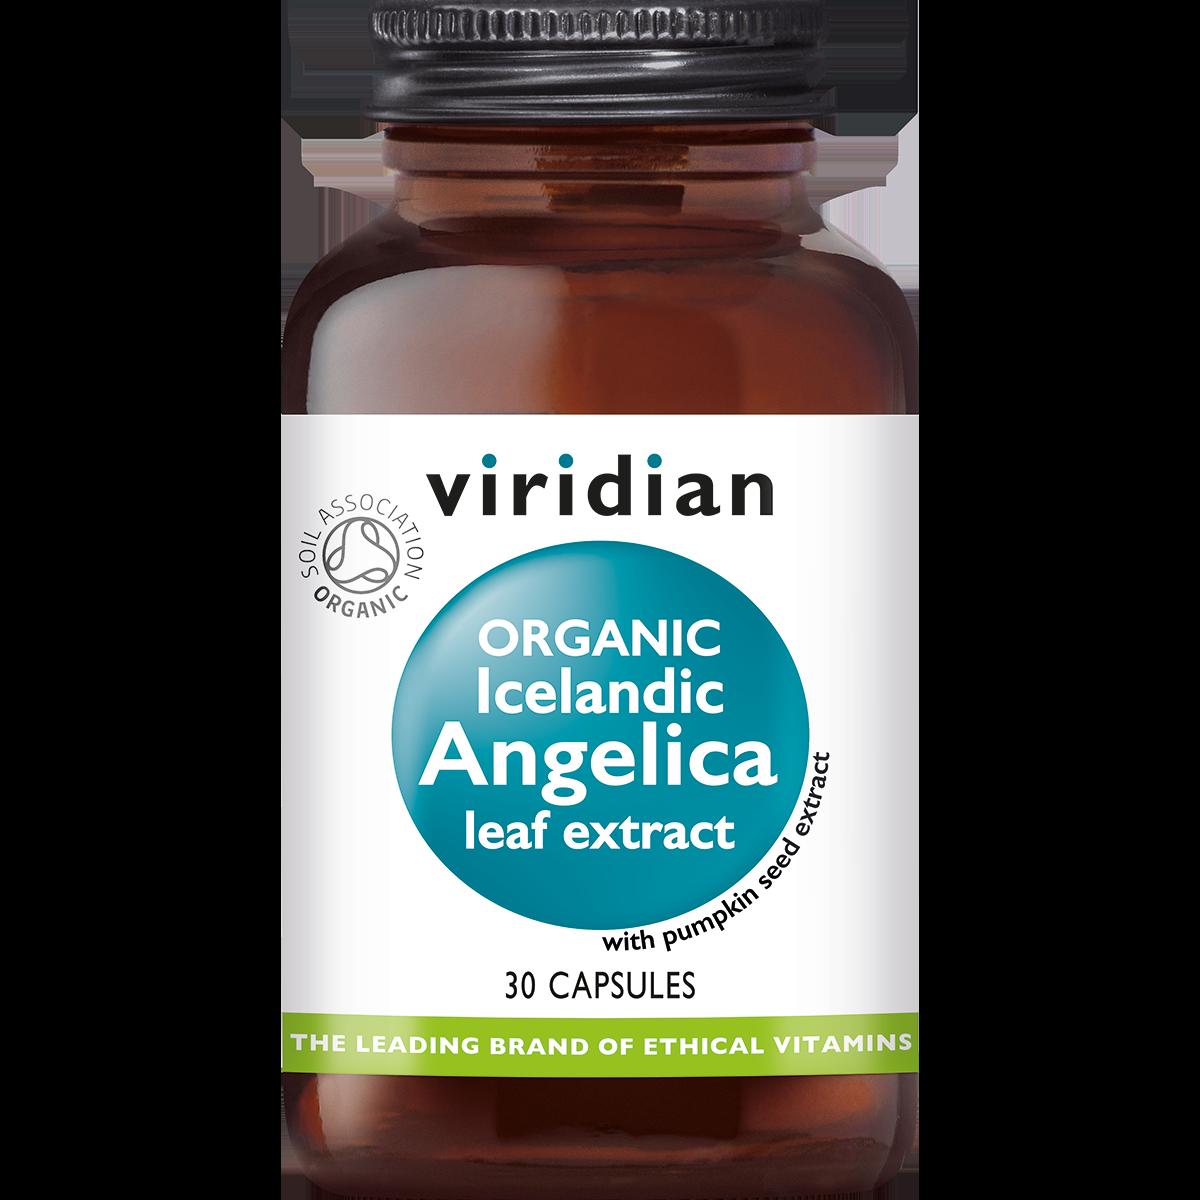 Organic Icelandic Angelica Leaf Extract 30 plantaardige capsules-1